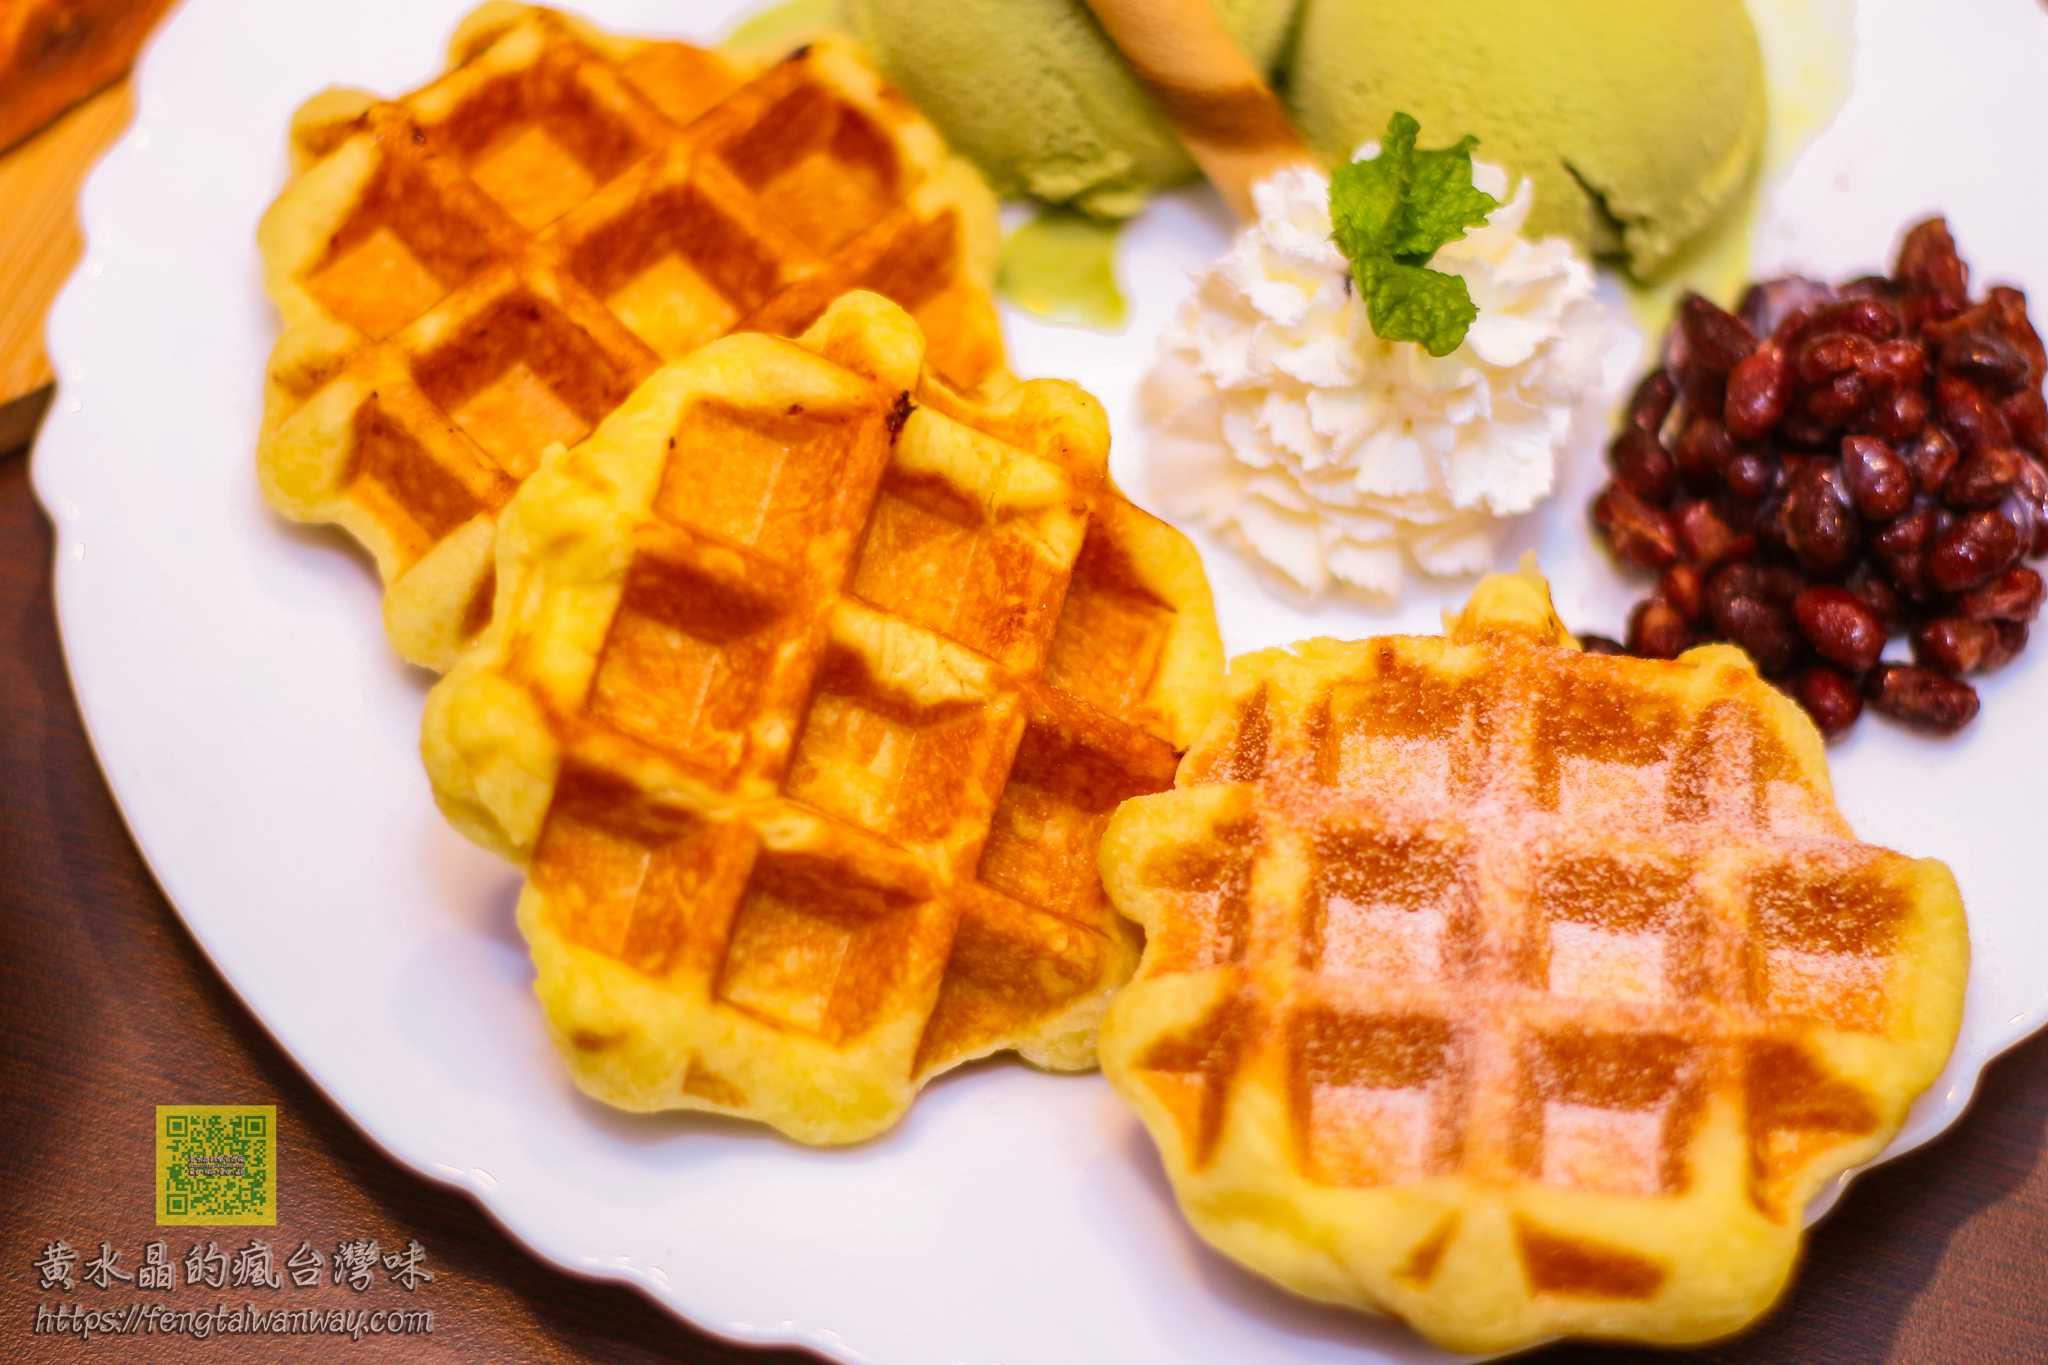 POPPY Waffle比利時烈日鬆餅莊敬店【桃園鬆餅】|莊敬國小門口巷弄內口感Q彈紮實的隱藏版鬆餅店 @黃水晶的瘋台灣味